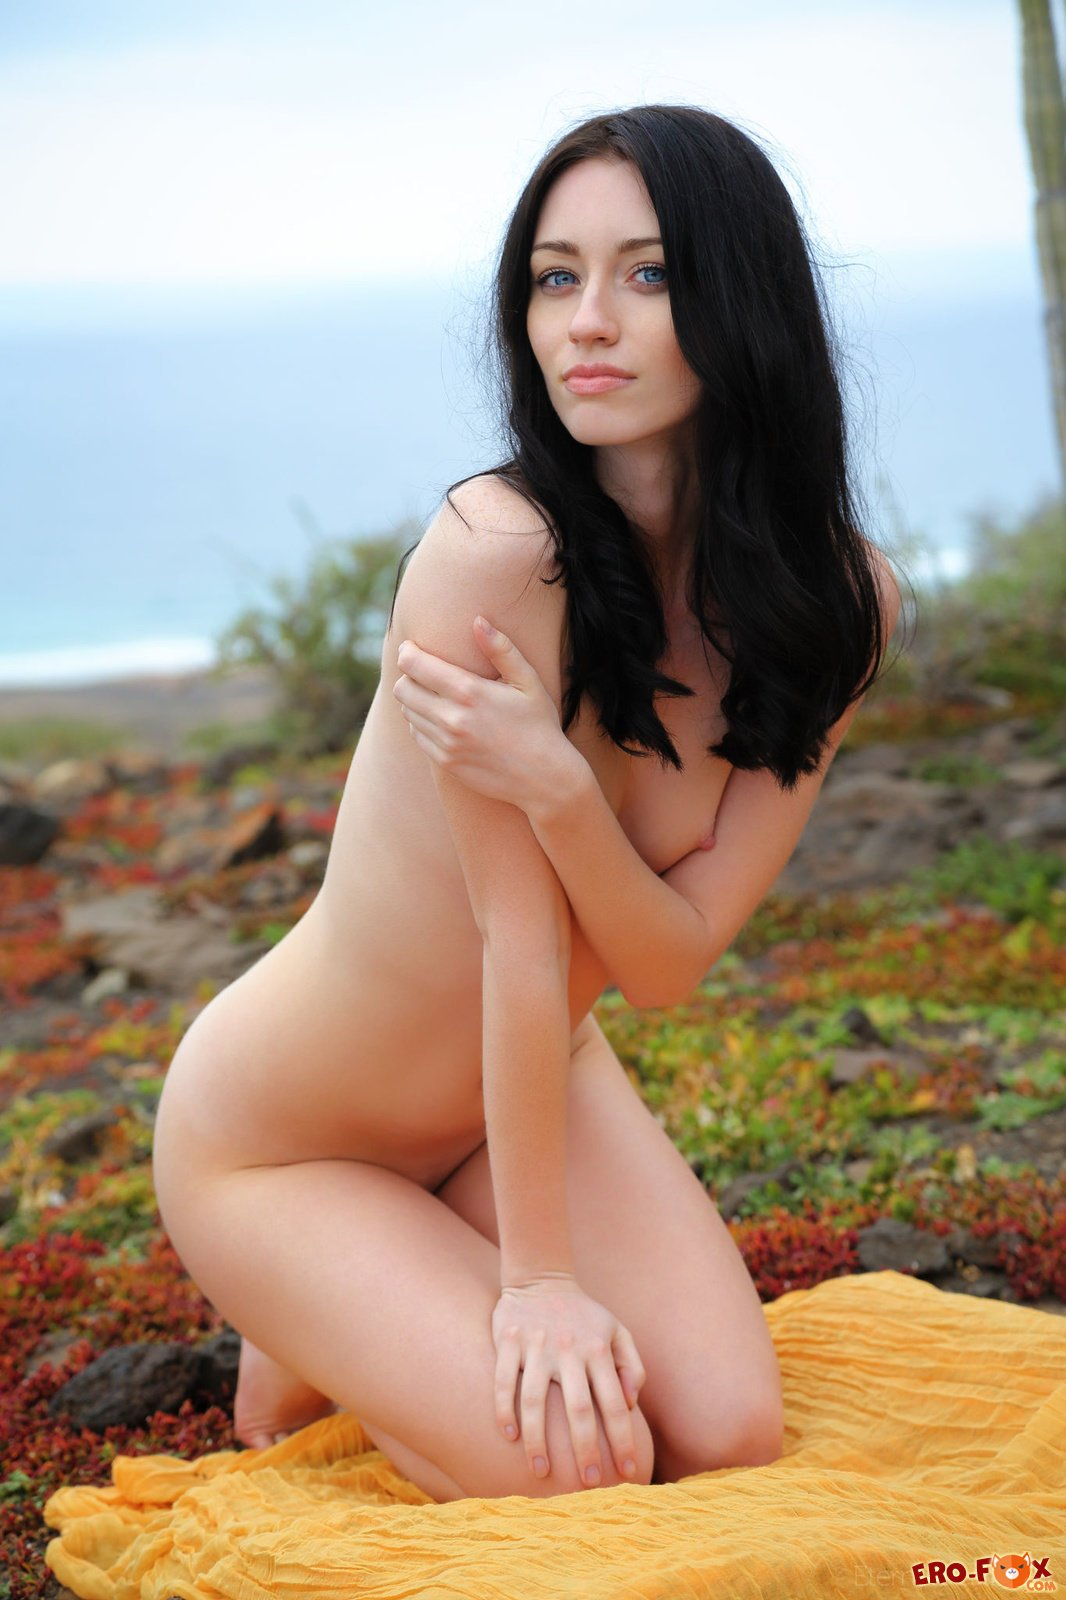 Хрупкая голая брюнетка на природе